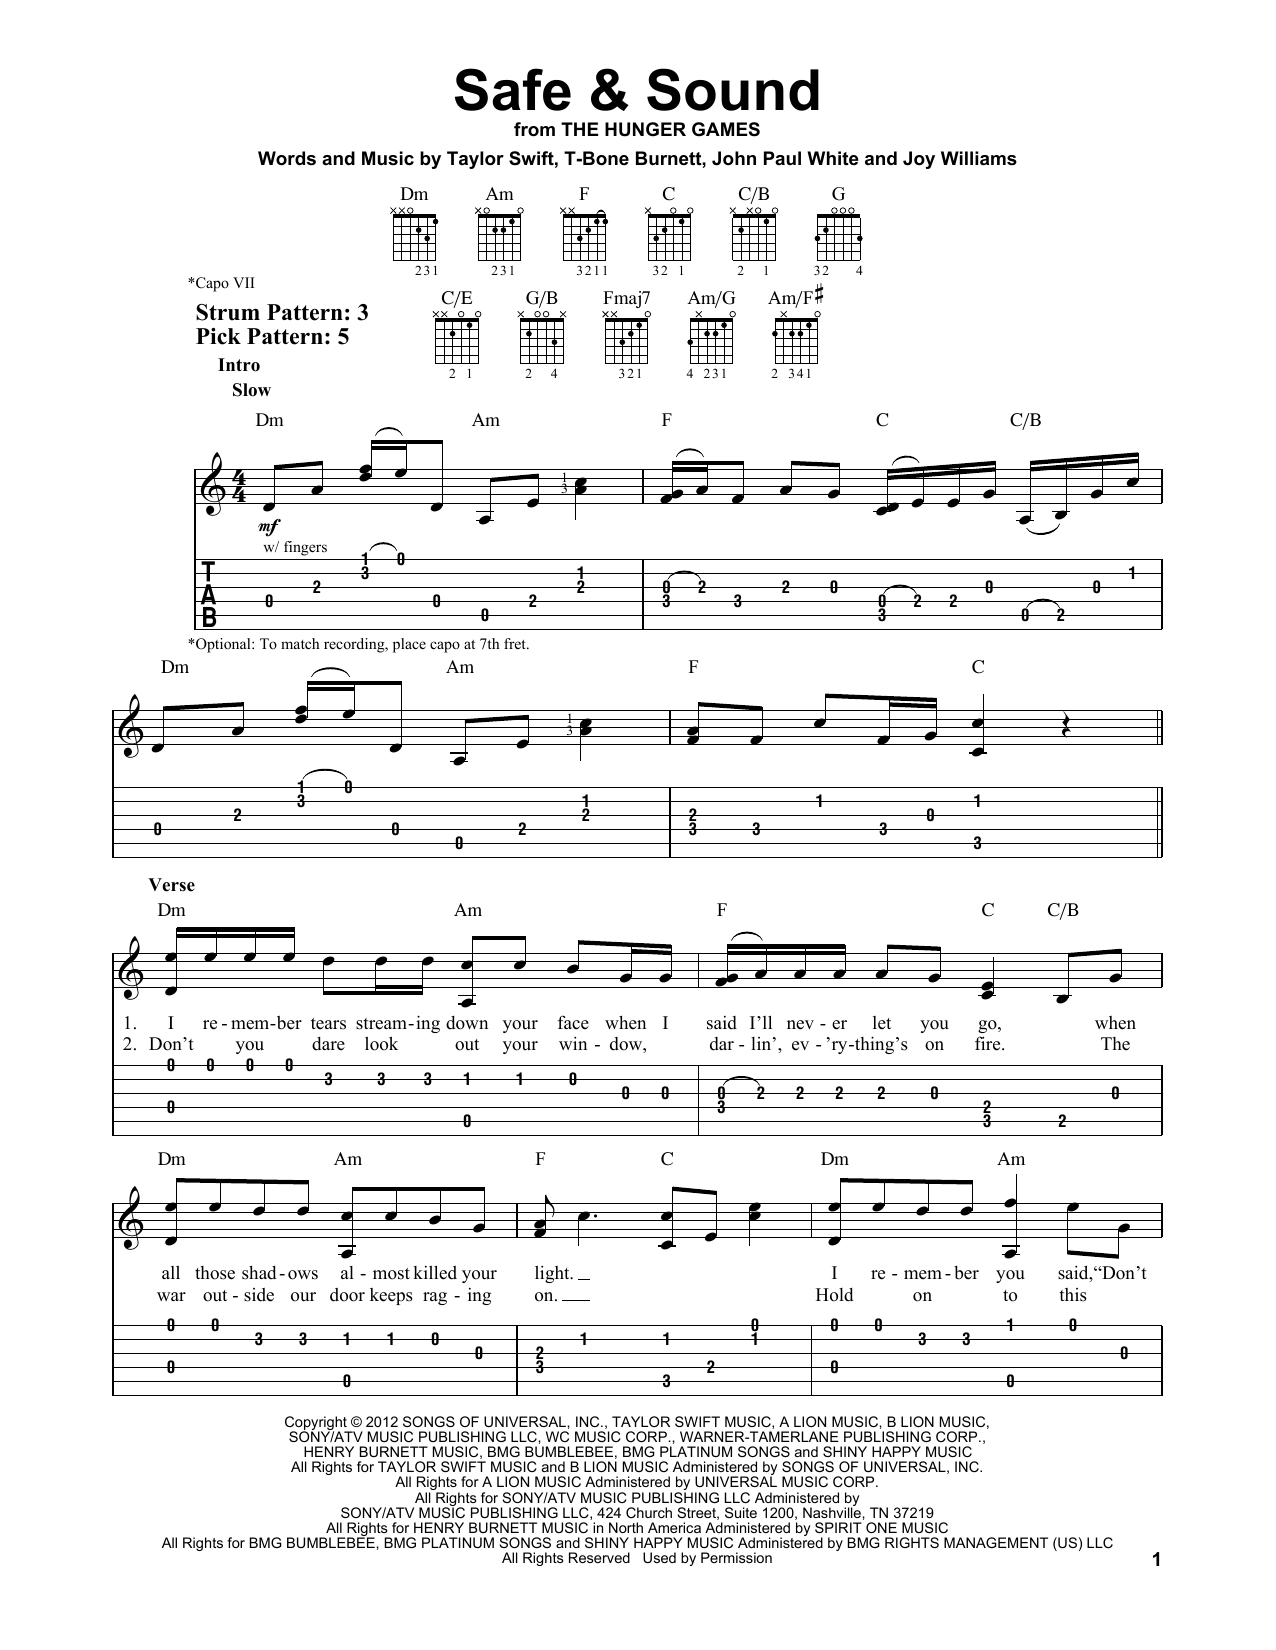 Sheet Music Digital Files To Print Licensed Joy Williams Digital